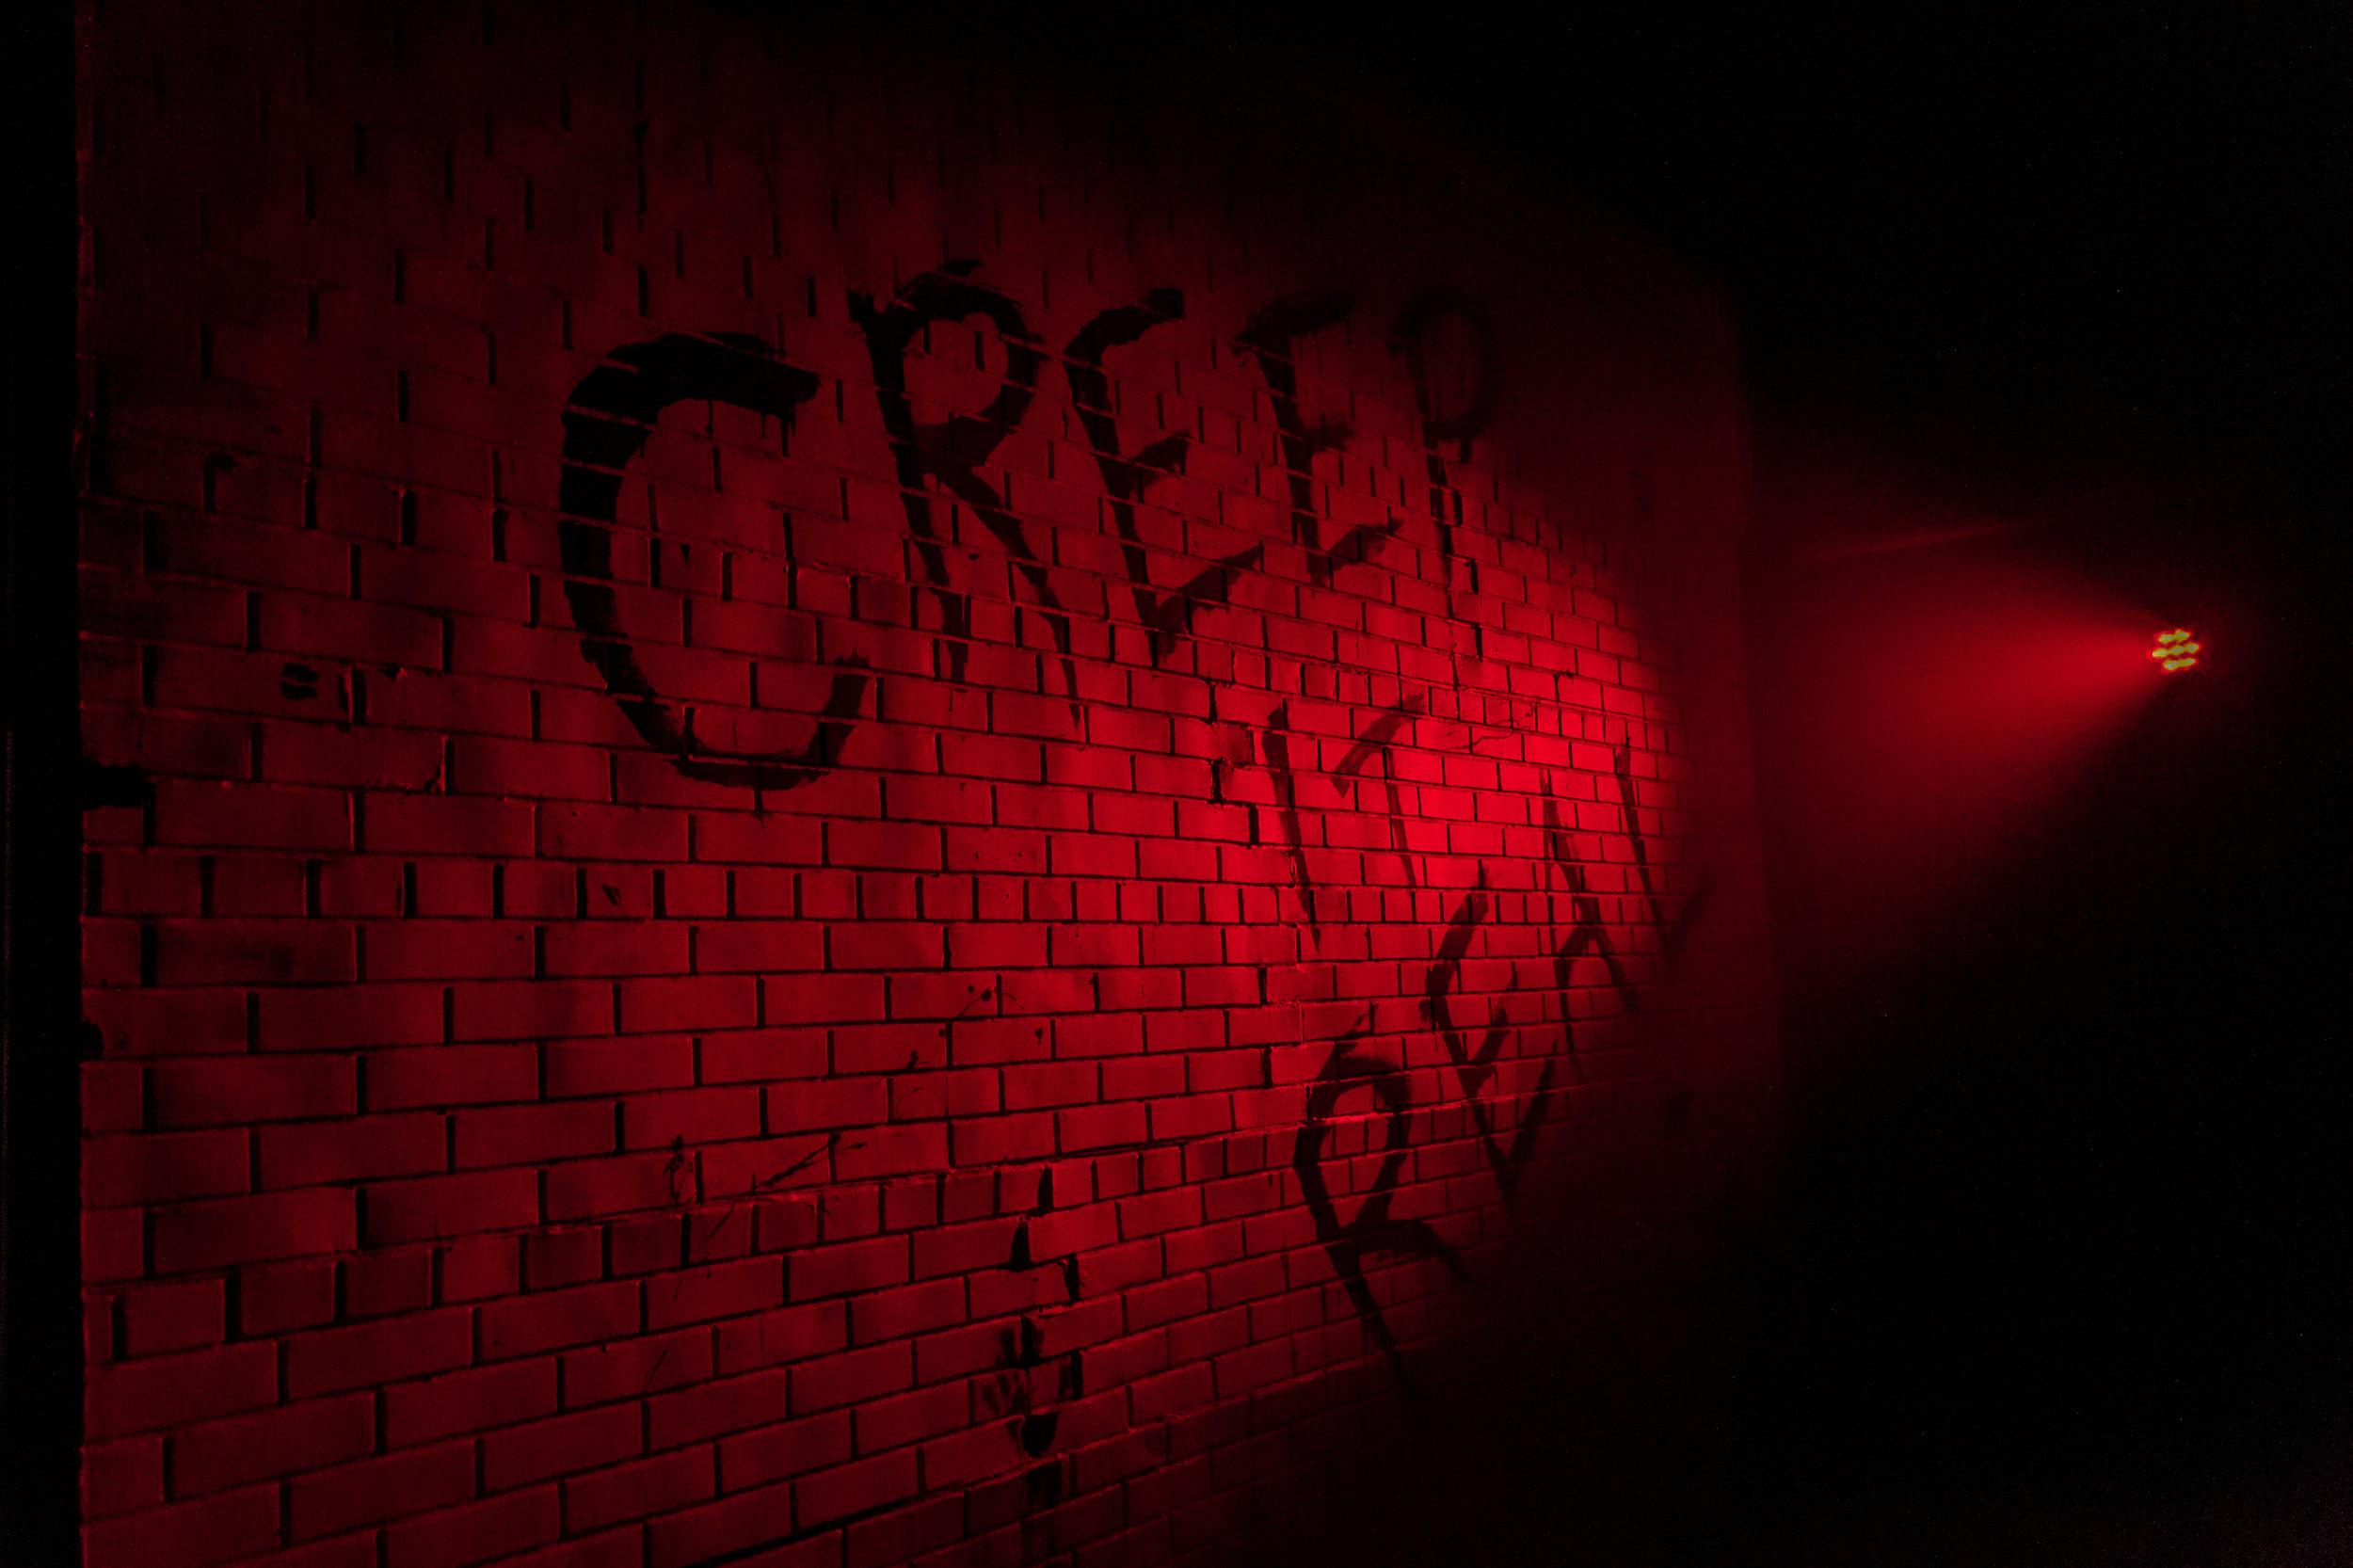 www.creepla.com